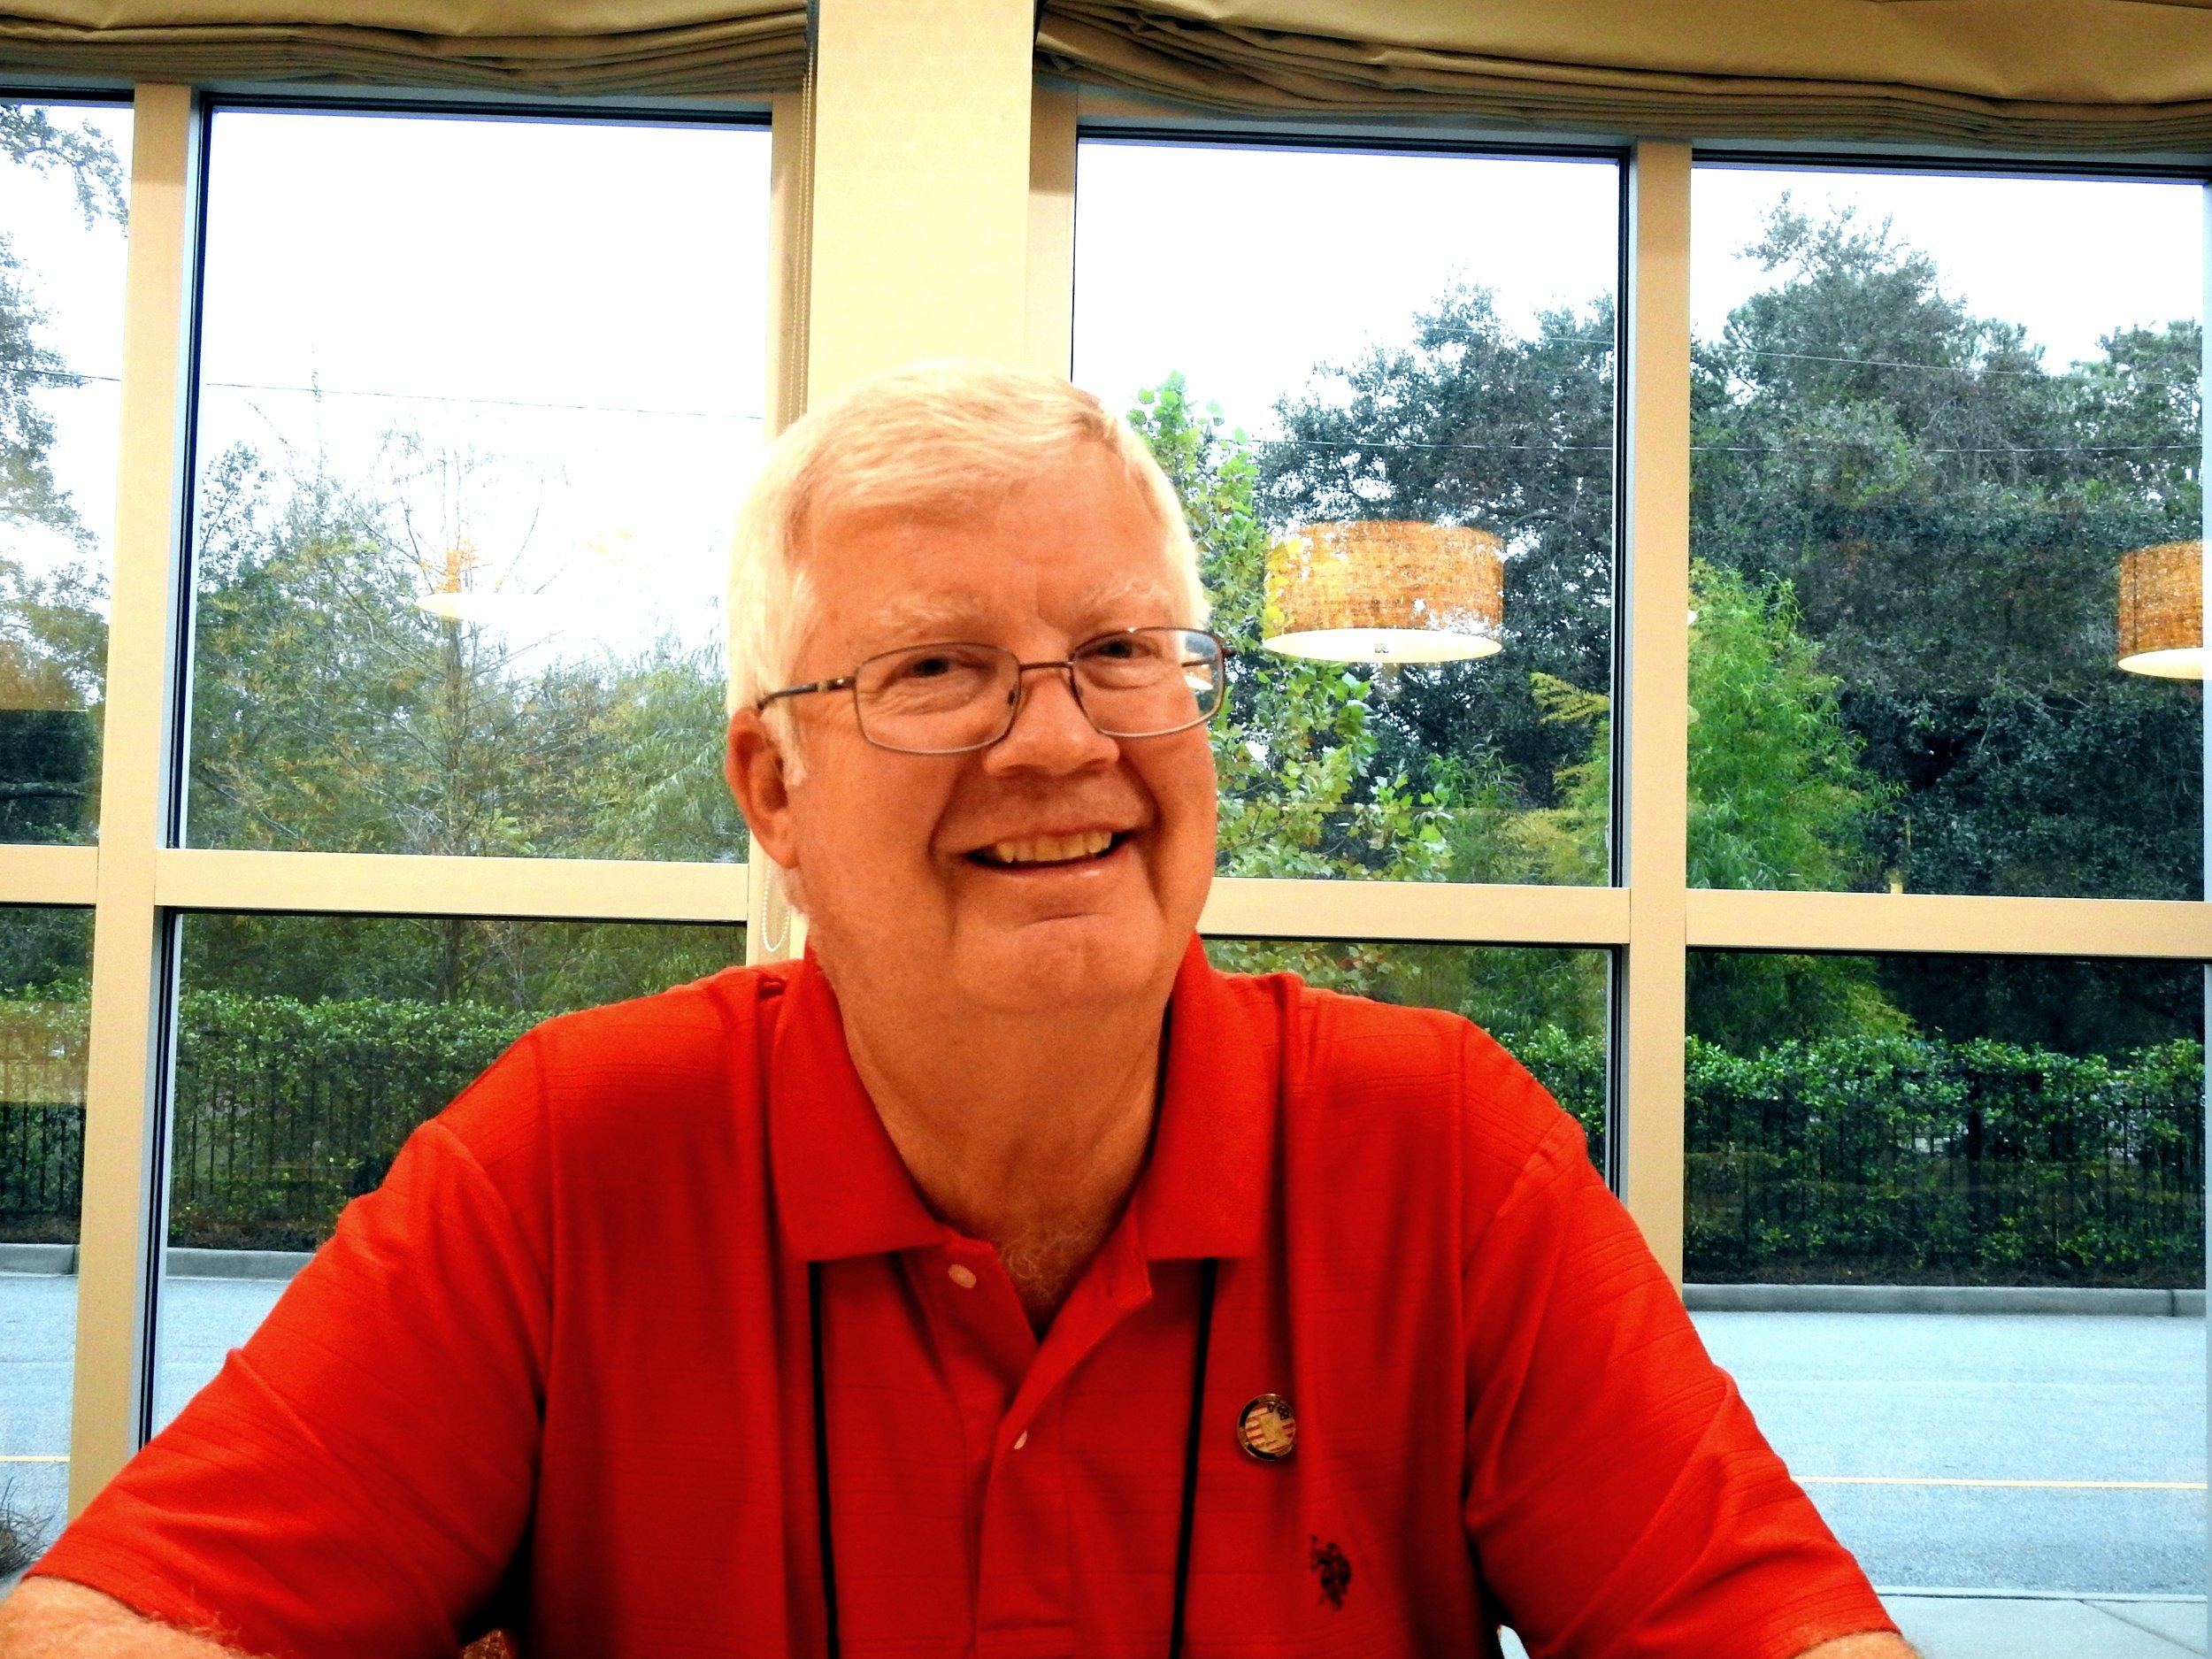 MWSA President Bob Doerr